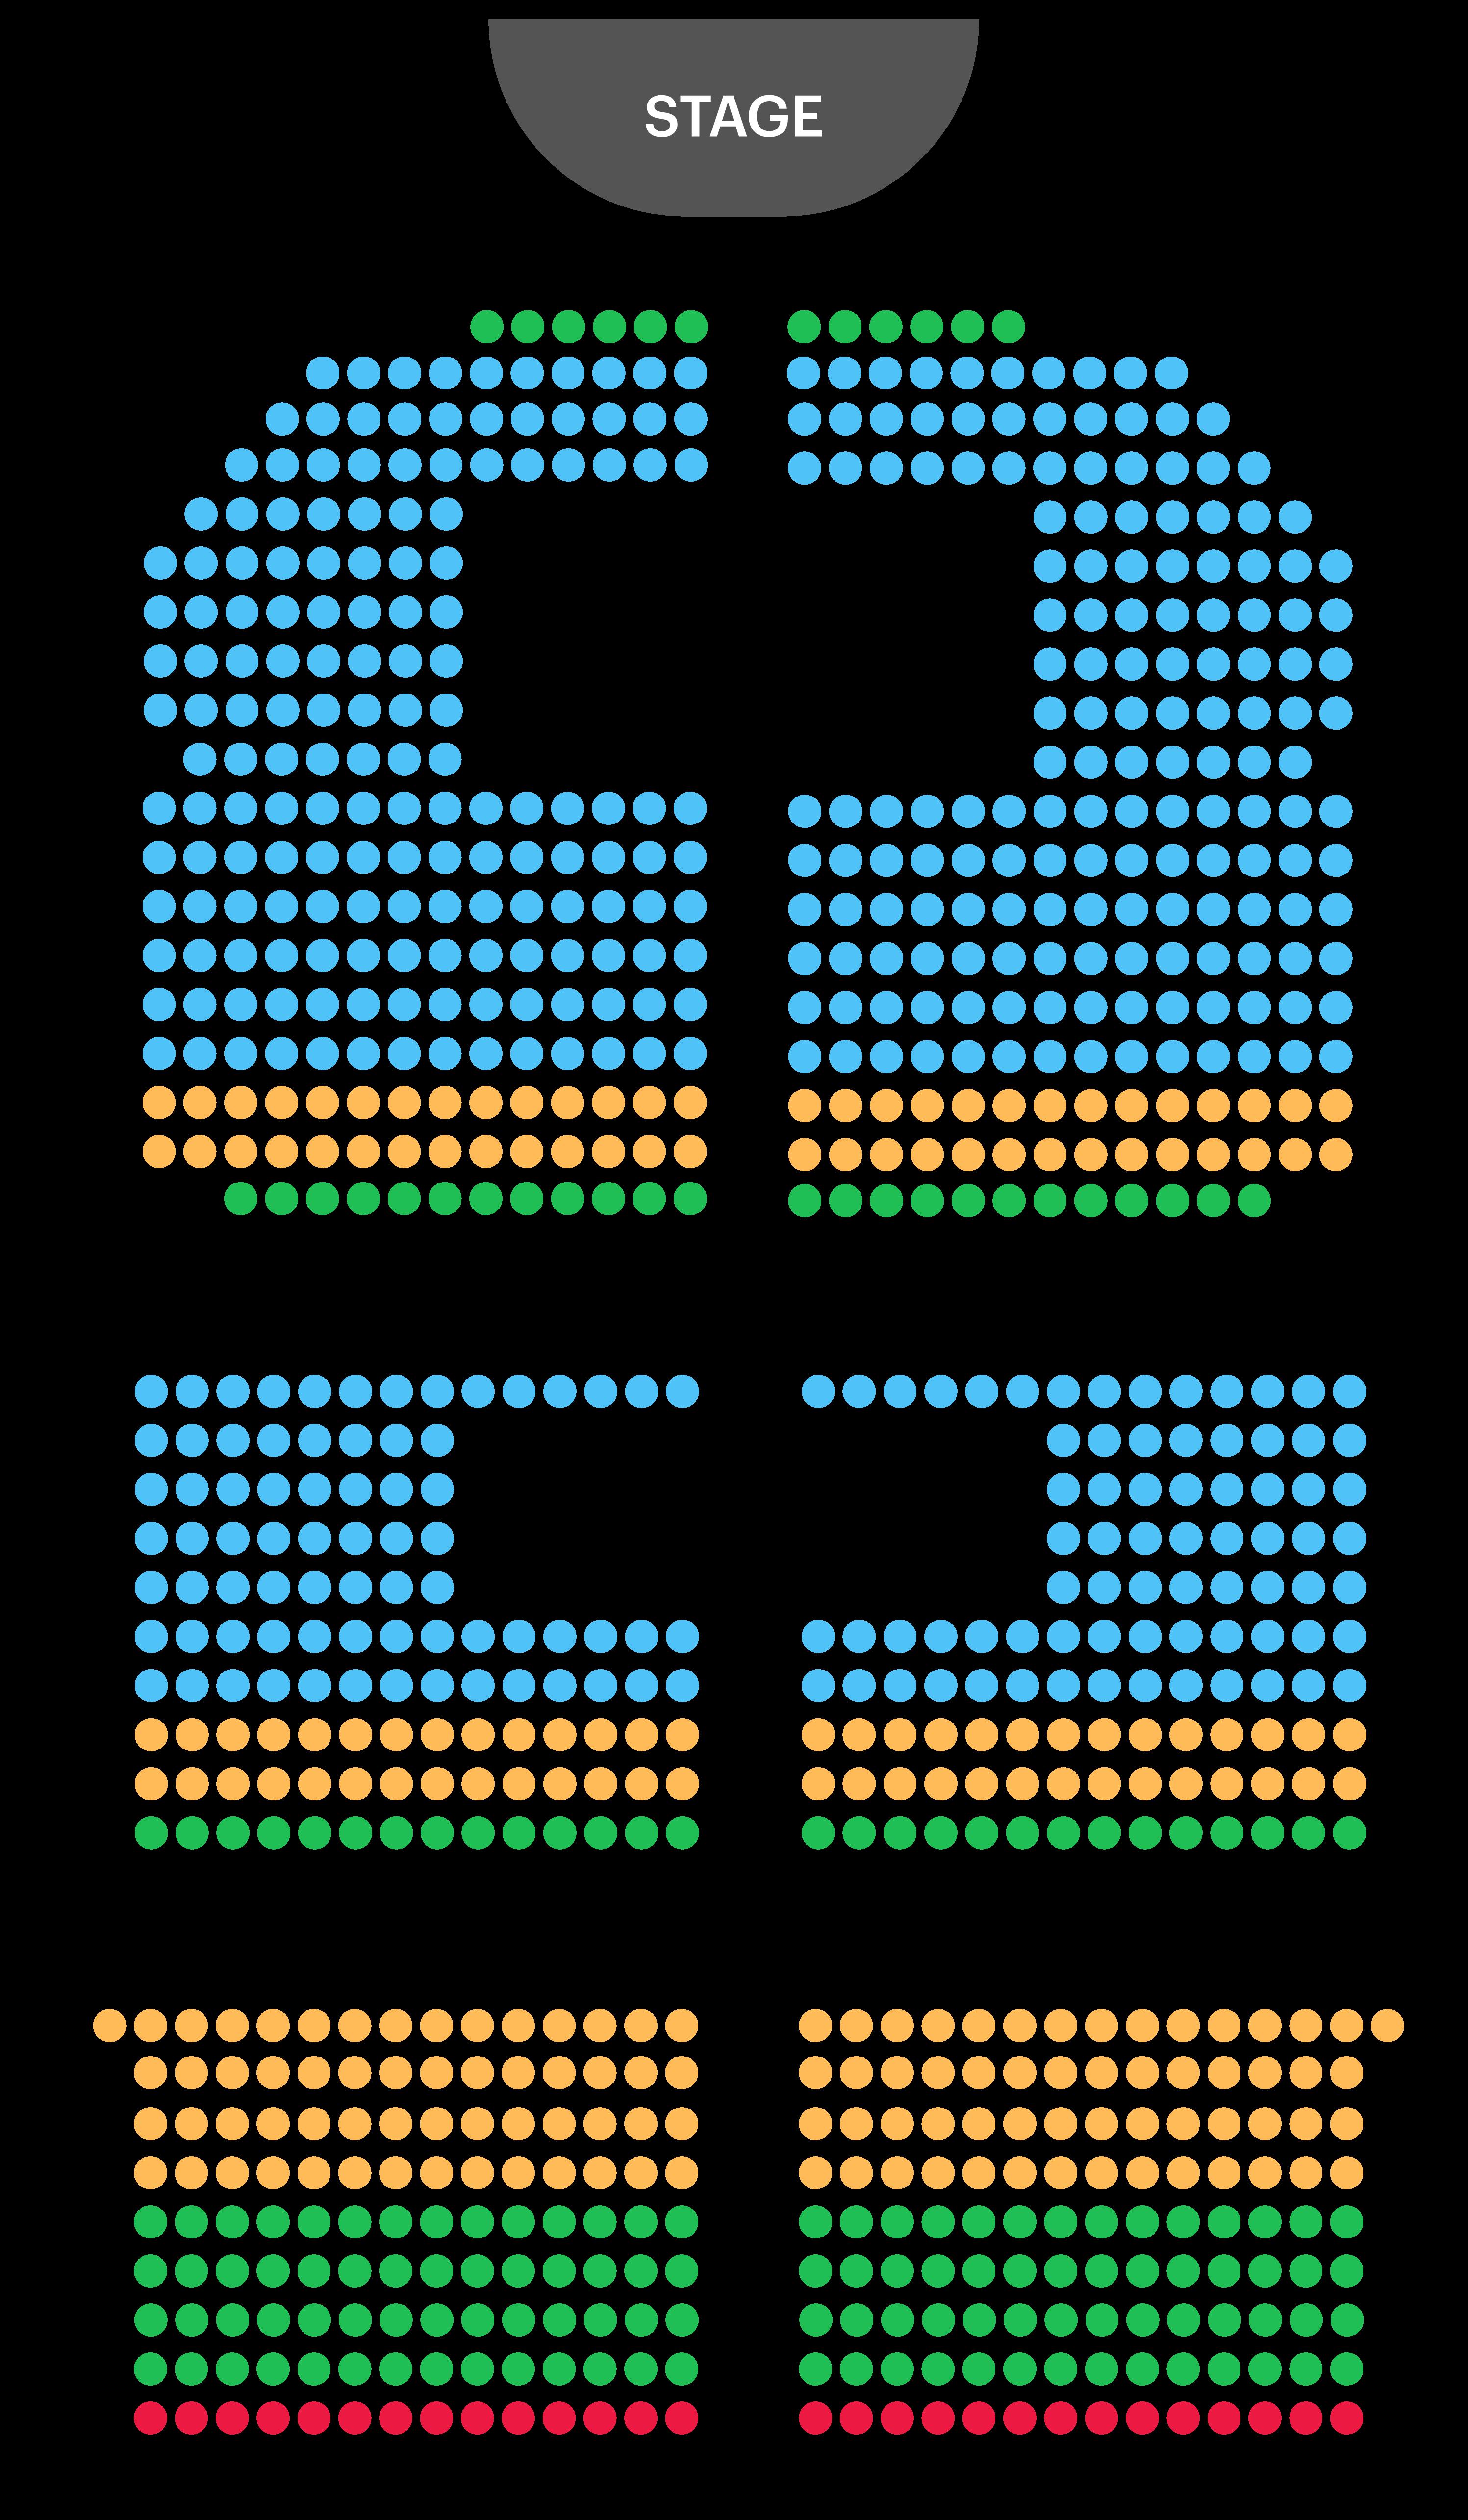 Phoenix Theatre Seating Map